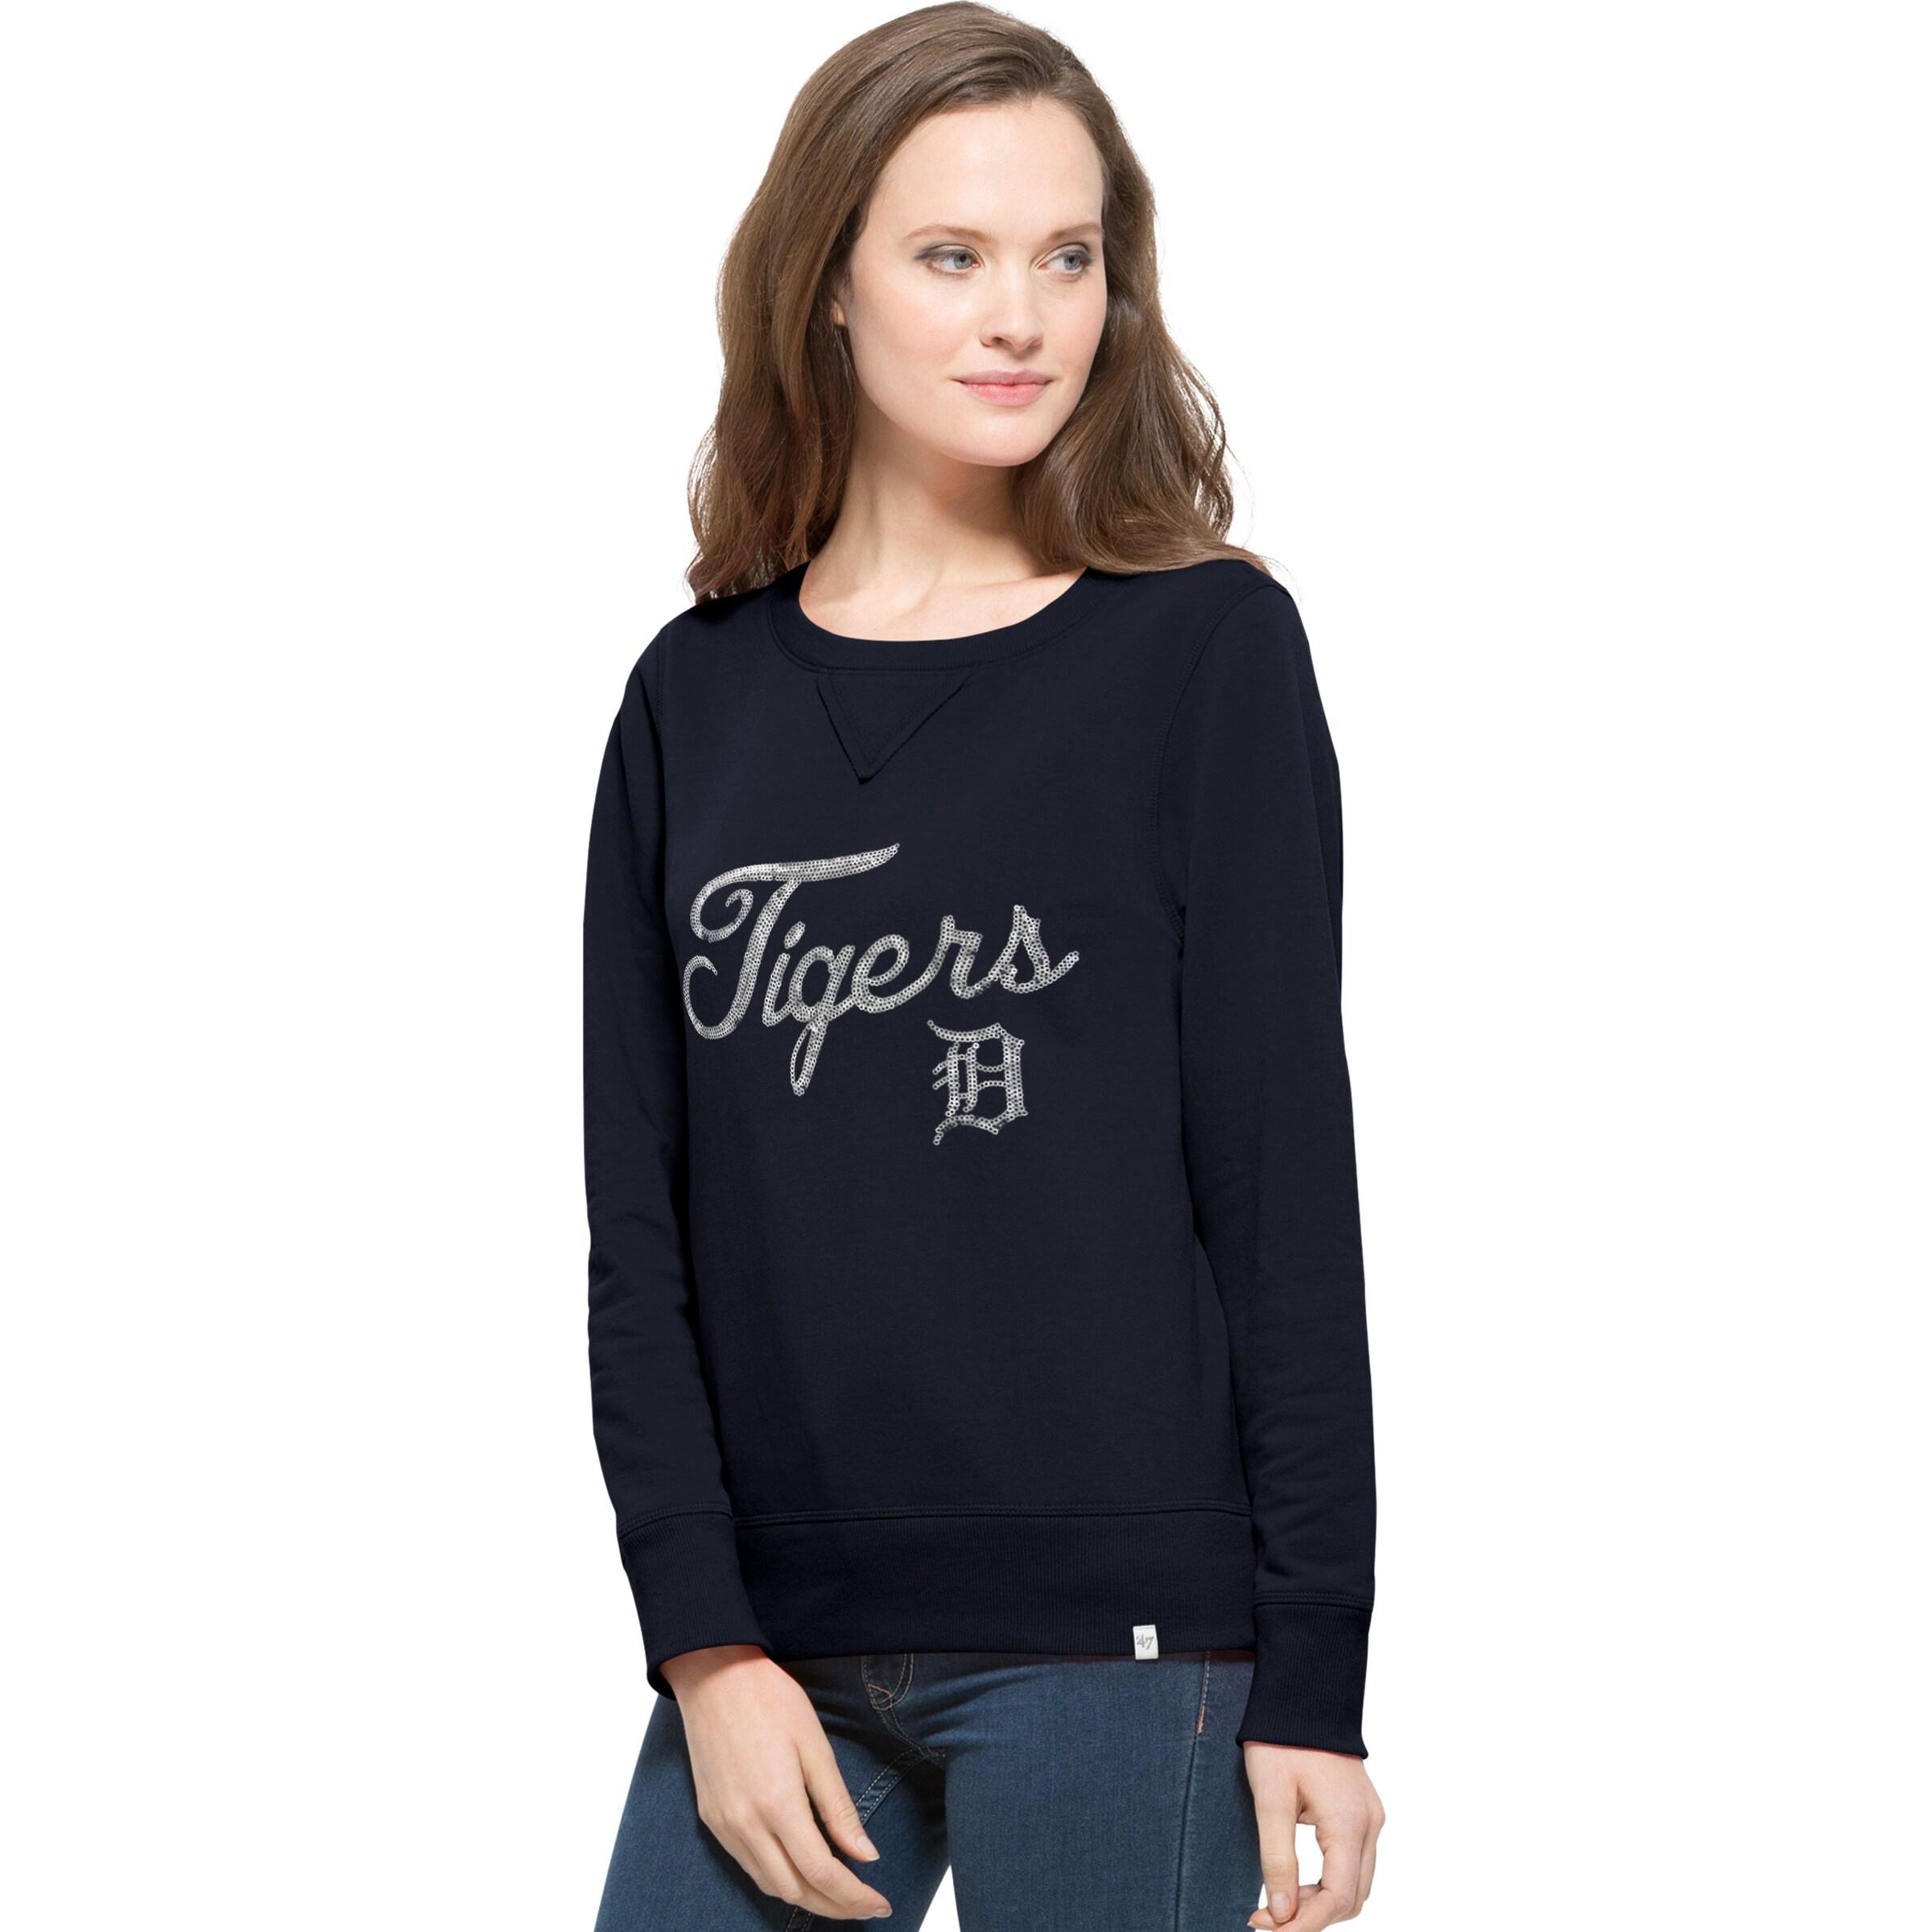 Detroit Tigers '47 Women's Sparkle Cross-Check Crew Neck Sweatshirt - Navy